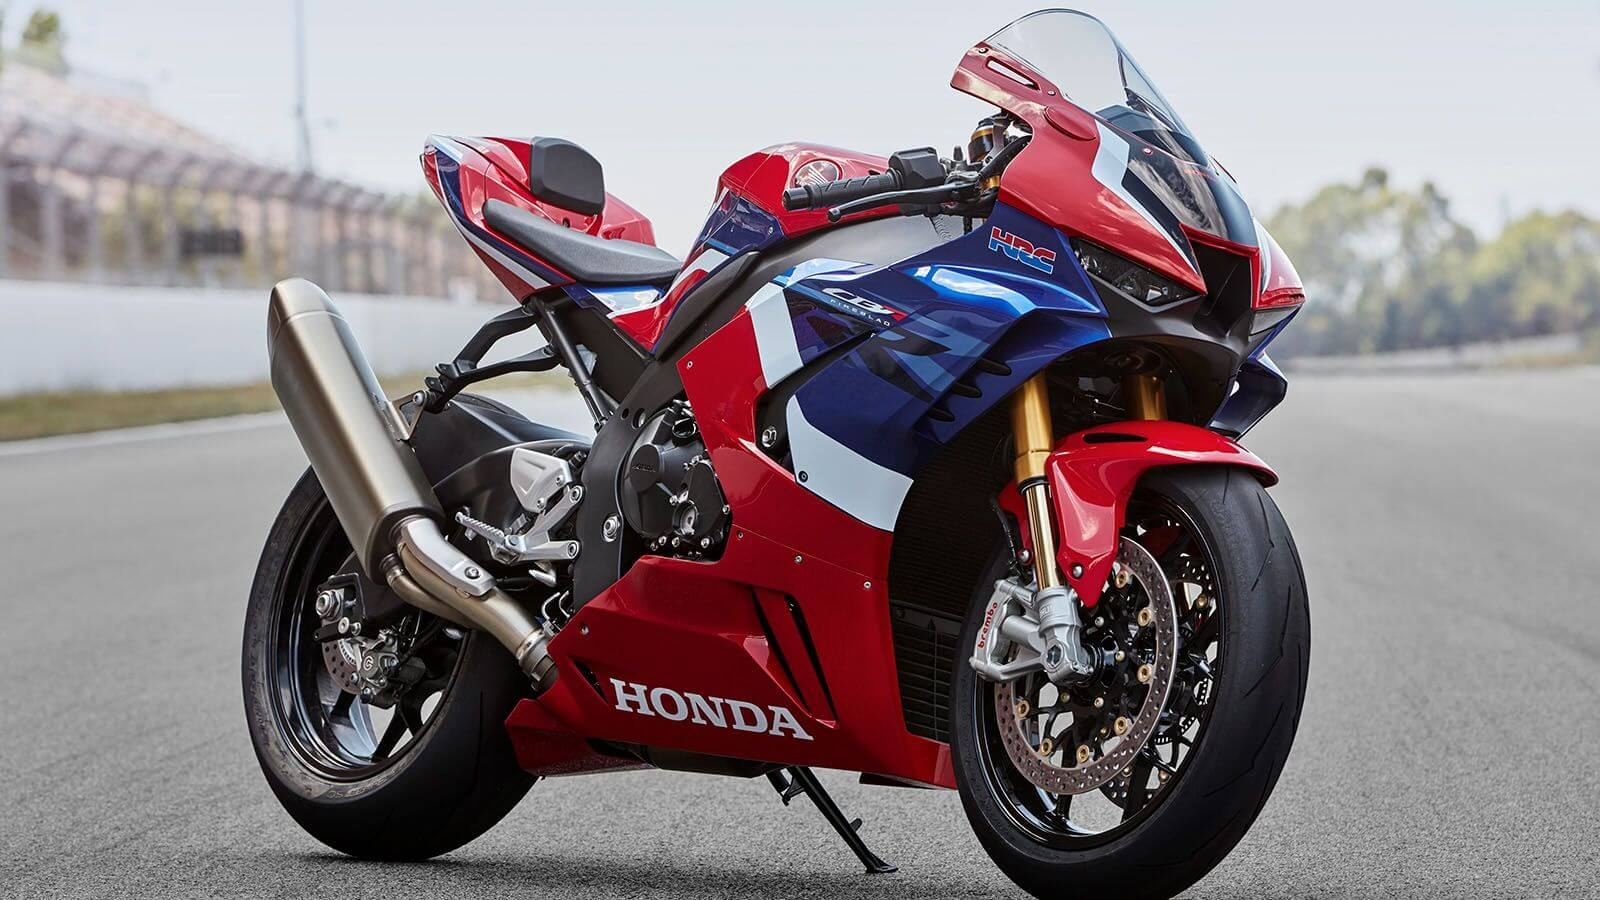 Honda fireblade 2020